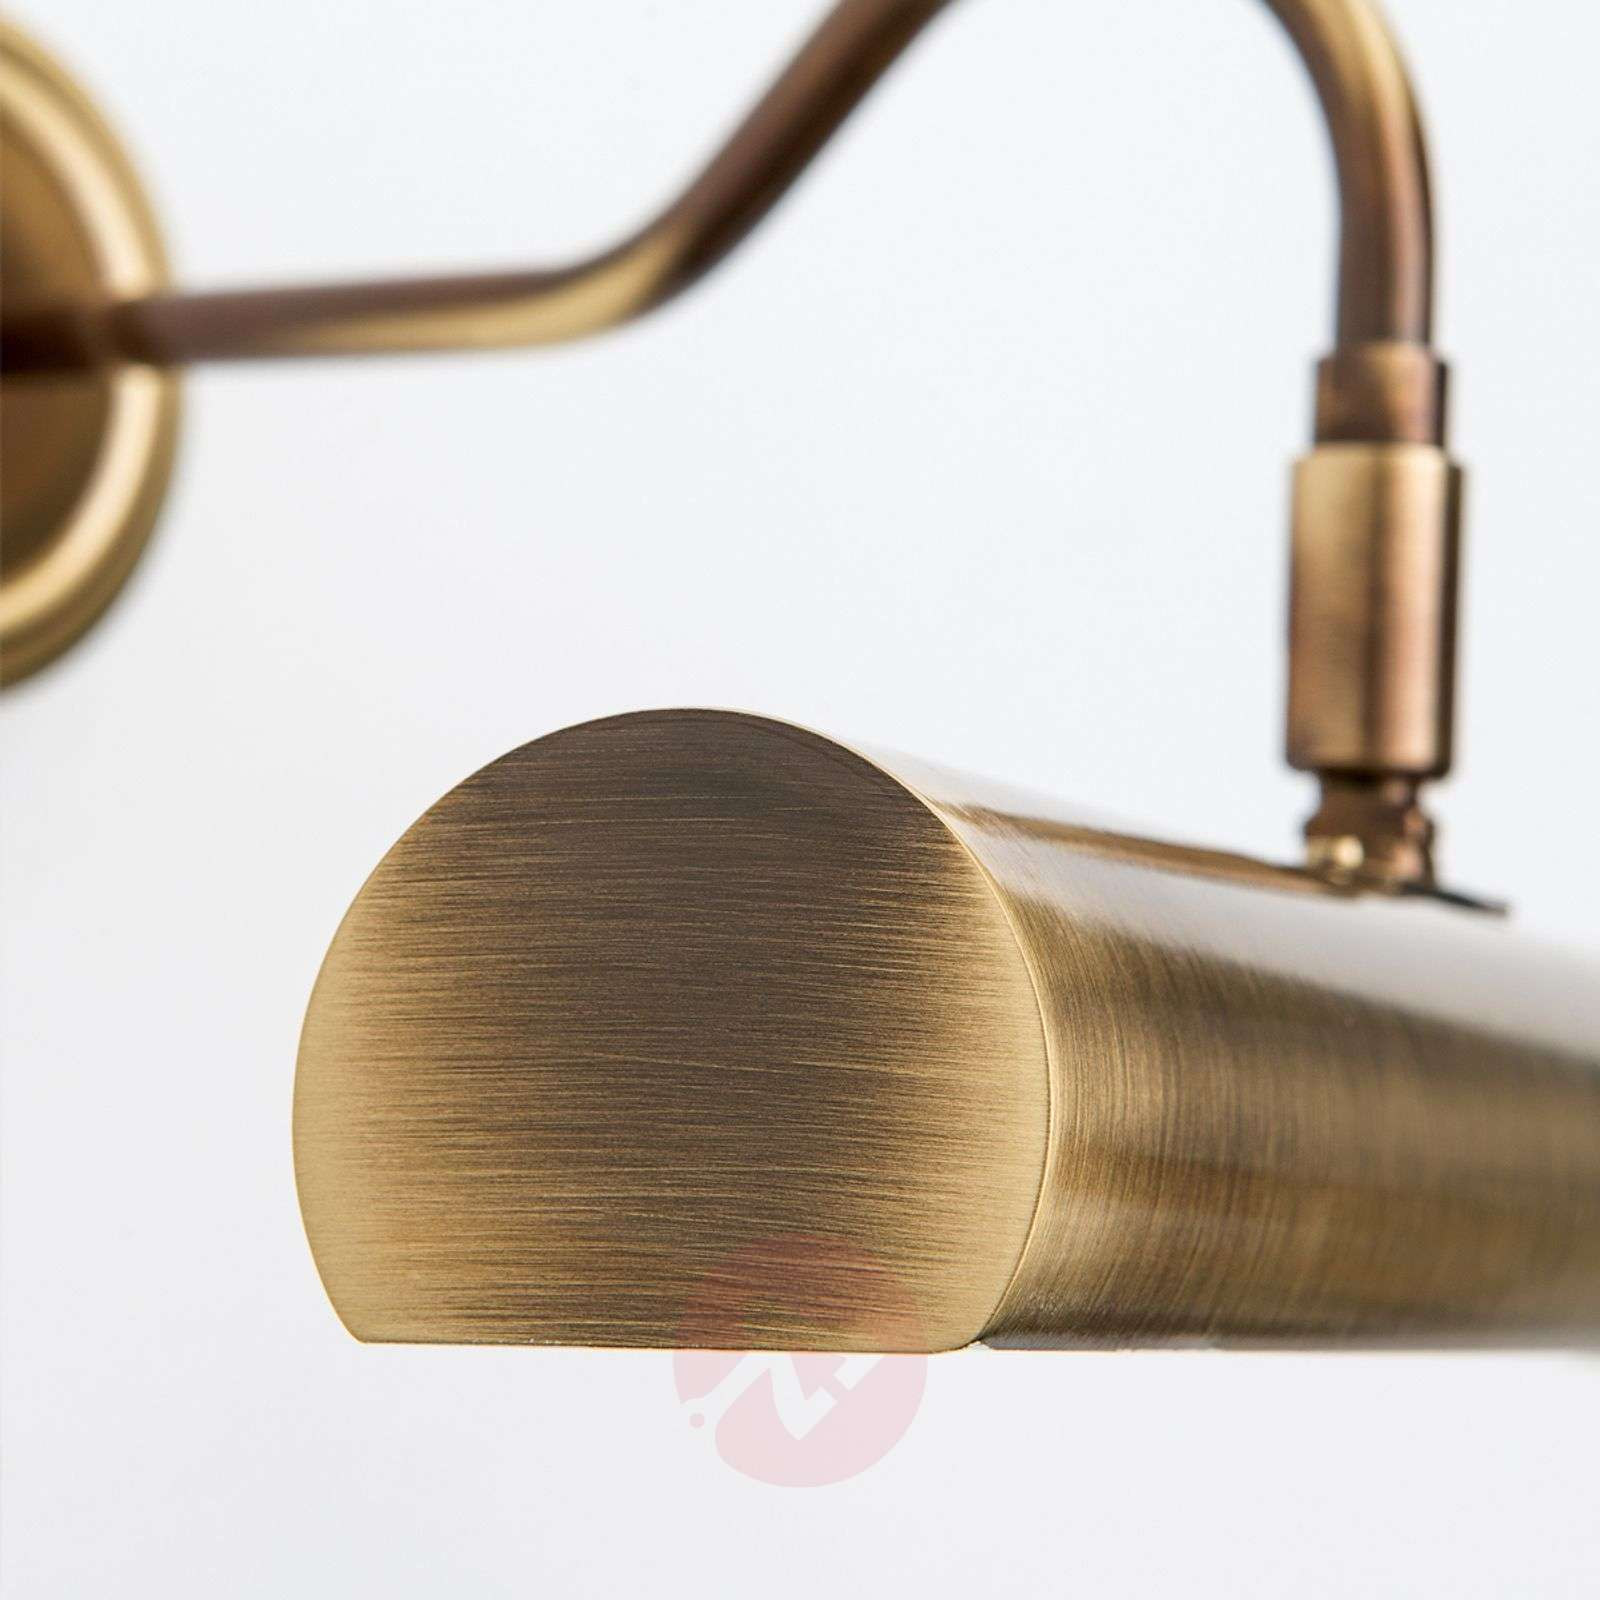 Vanhamessingin värinen Lariga-tauluvalaisin 35 cm-7255009-02